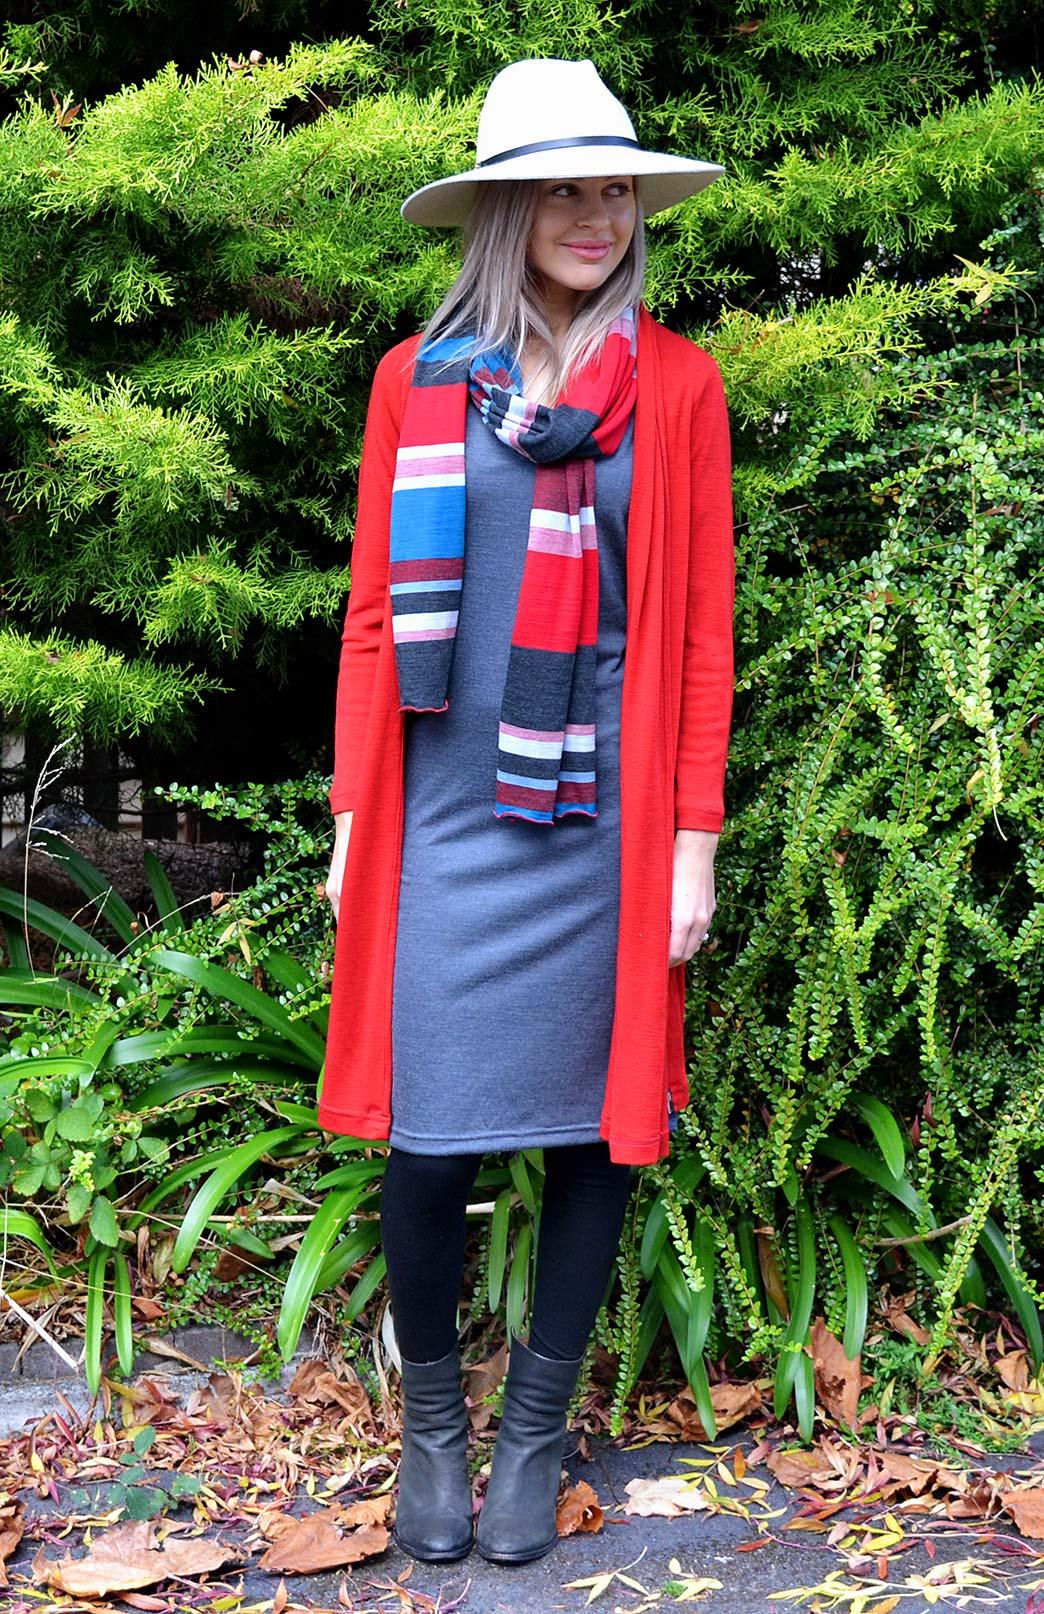 Long Drape Cardigan - Women's Flame Red Lightweight Merino Wool Long Drape - Smitten Merino Tasmania Australia